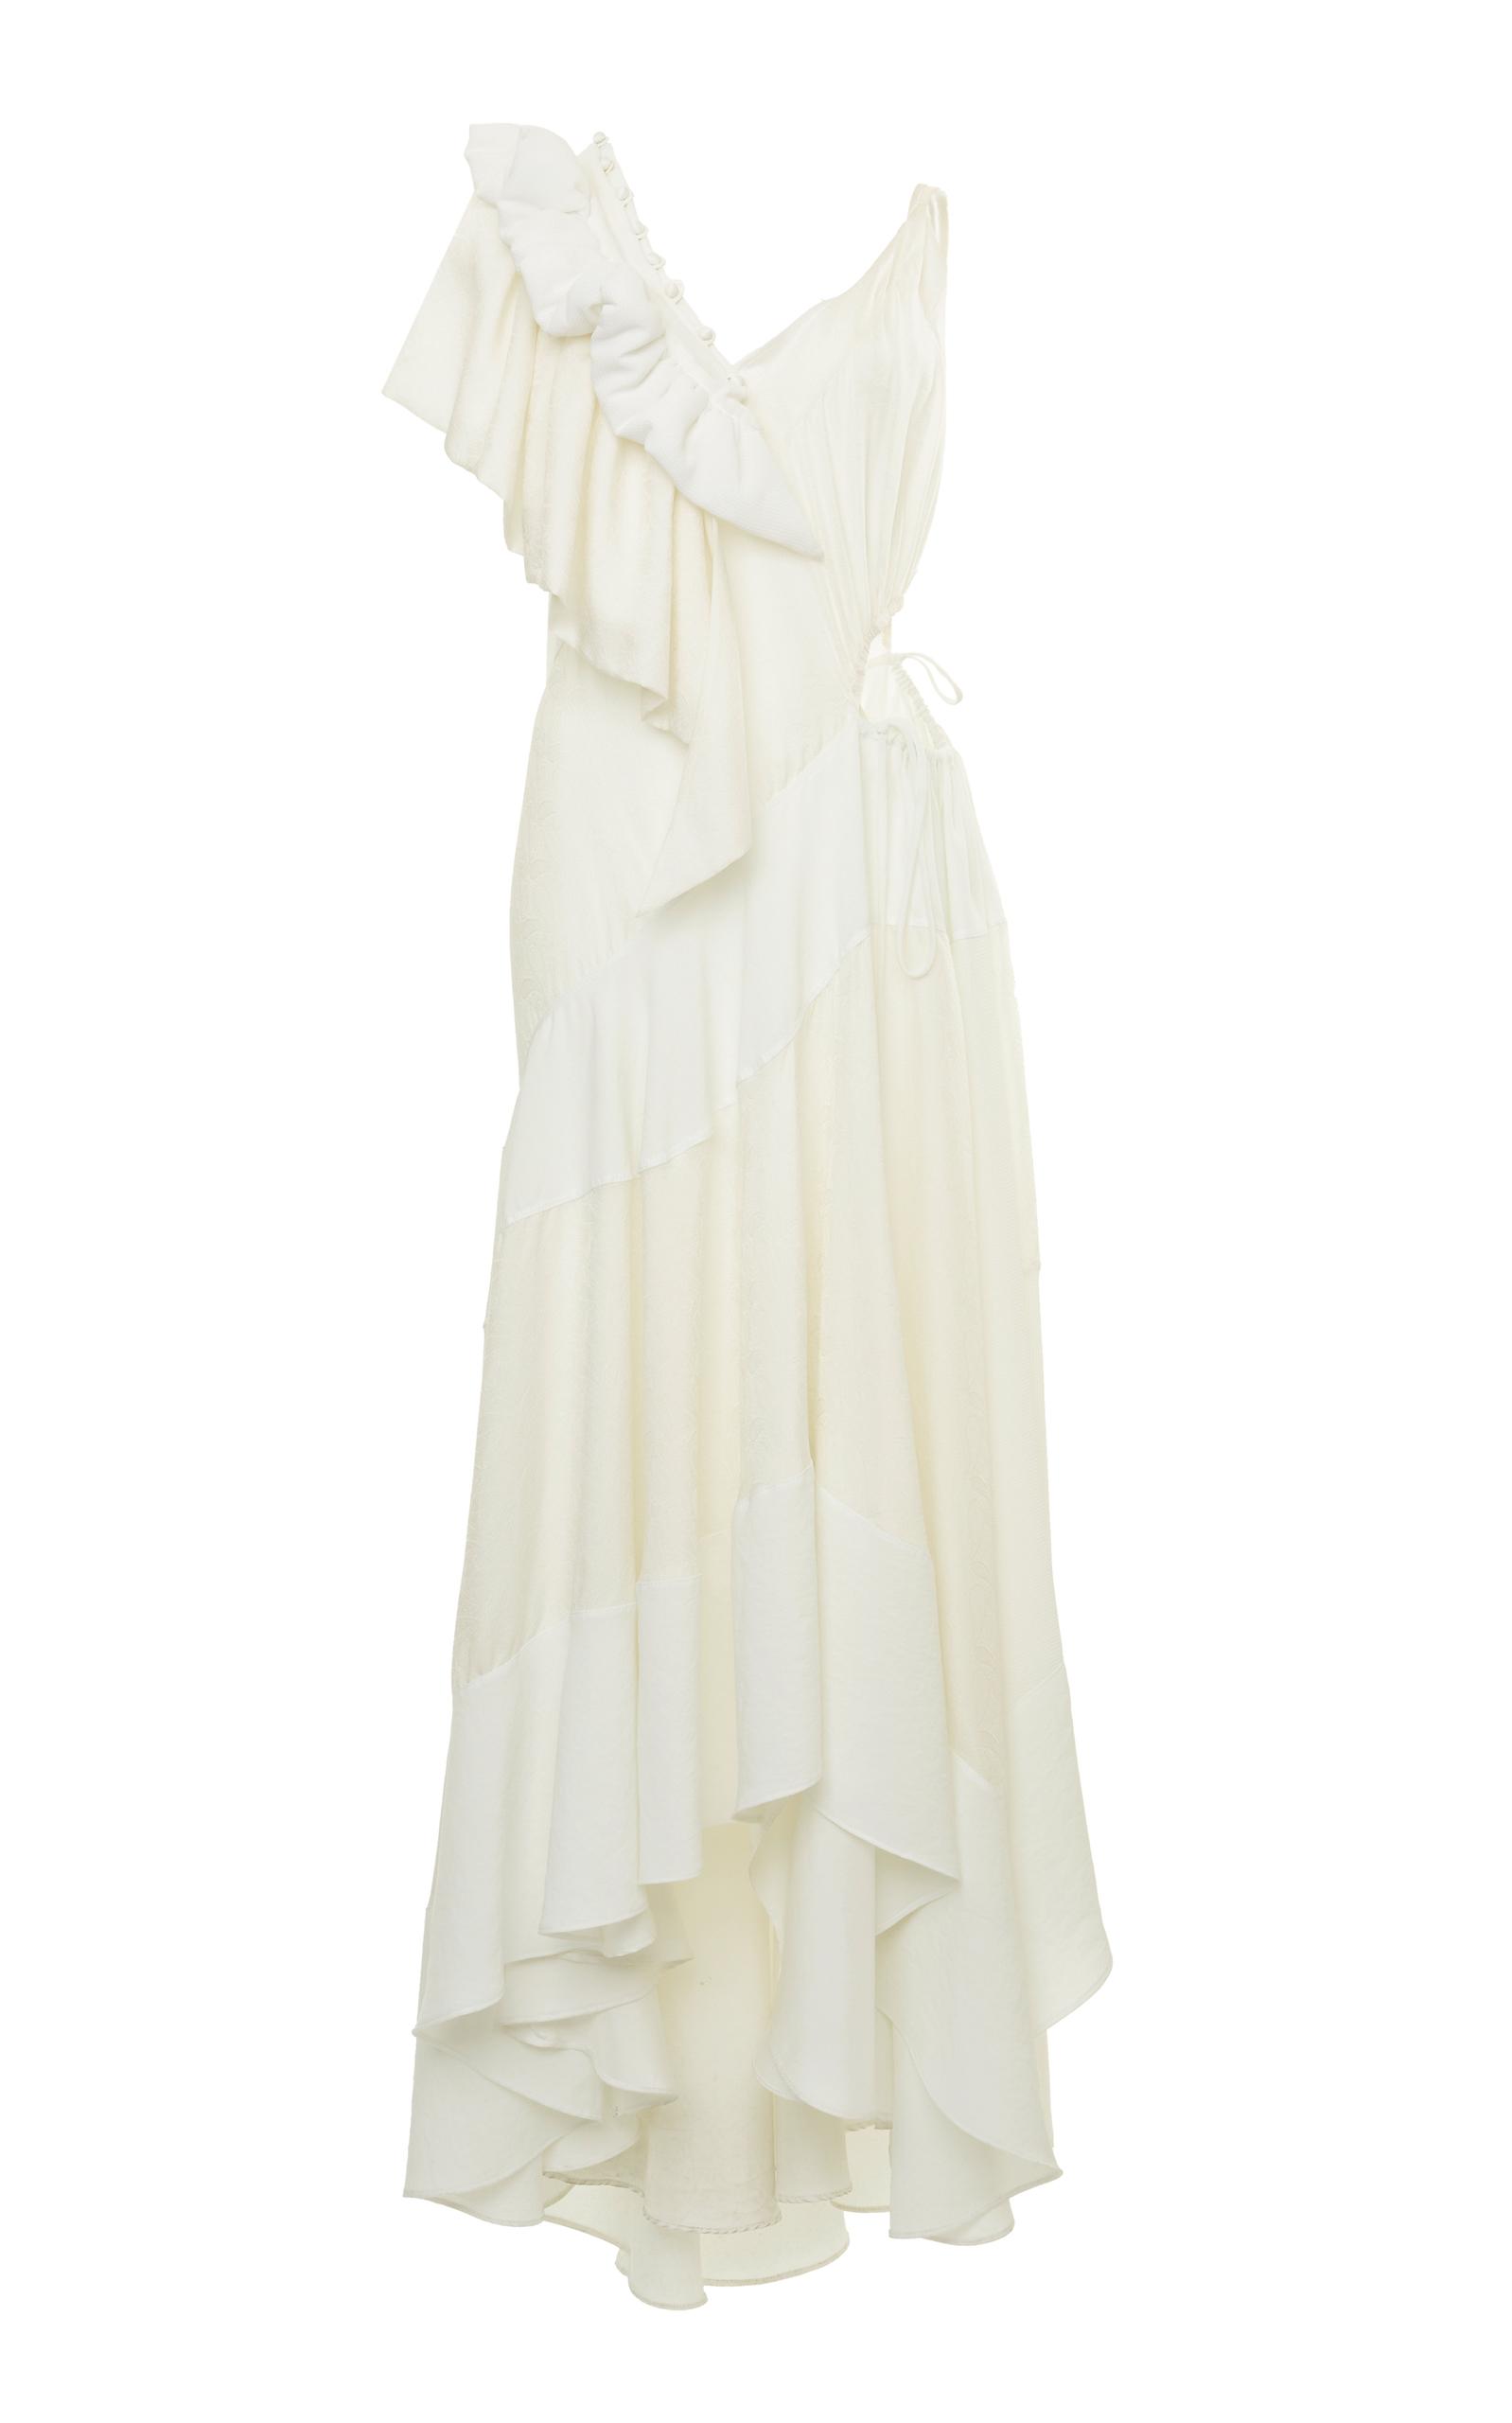 Cutout Ruffled Jacquard And Crepe Dress - White Loewe Buy Cheap Really arNhDyyyfN